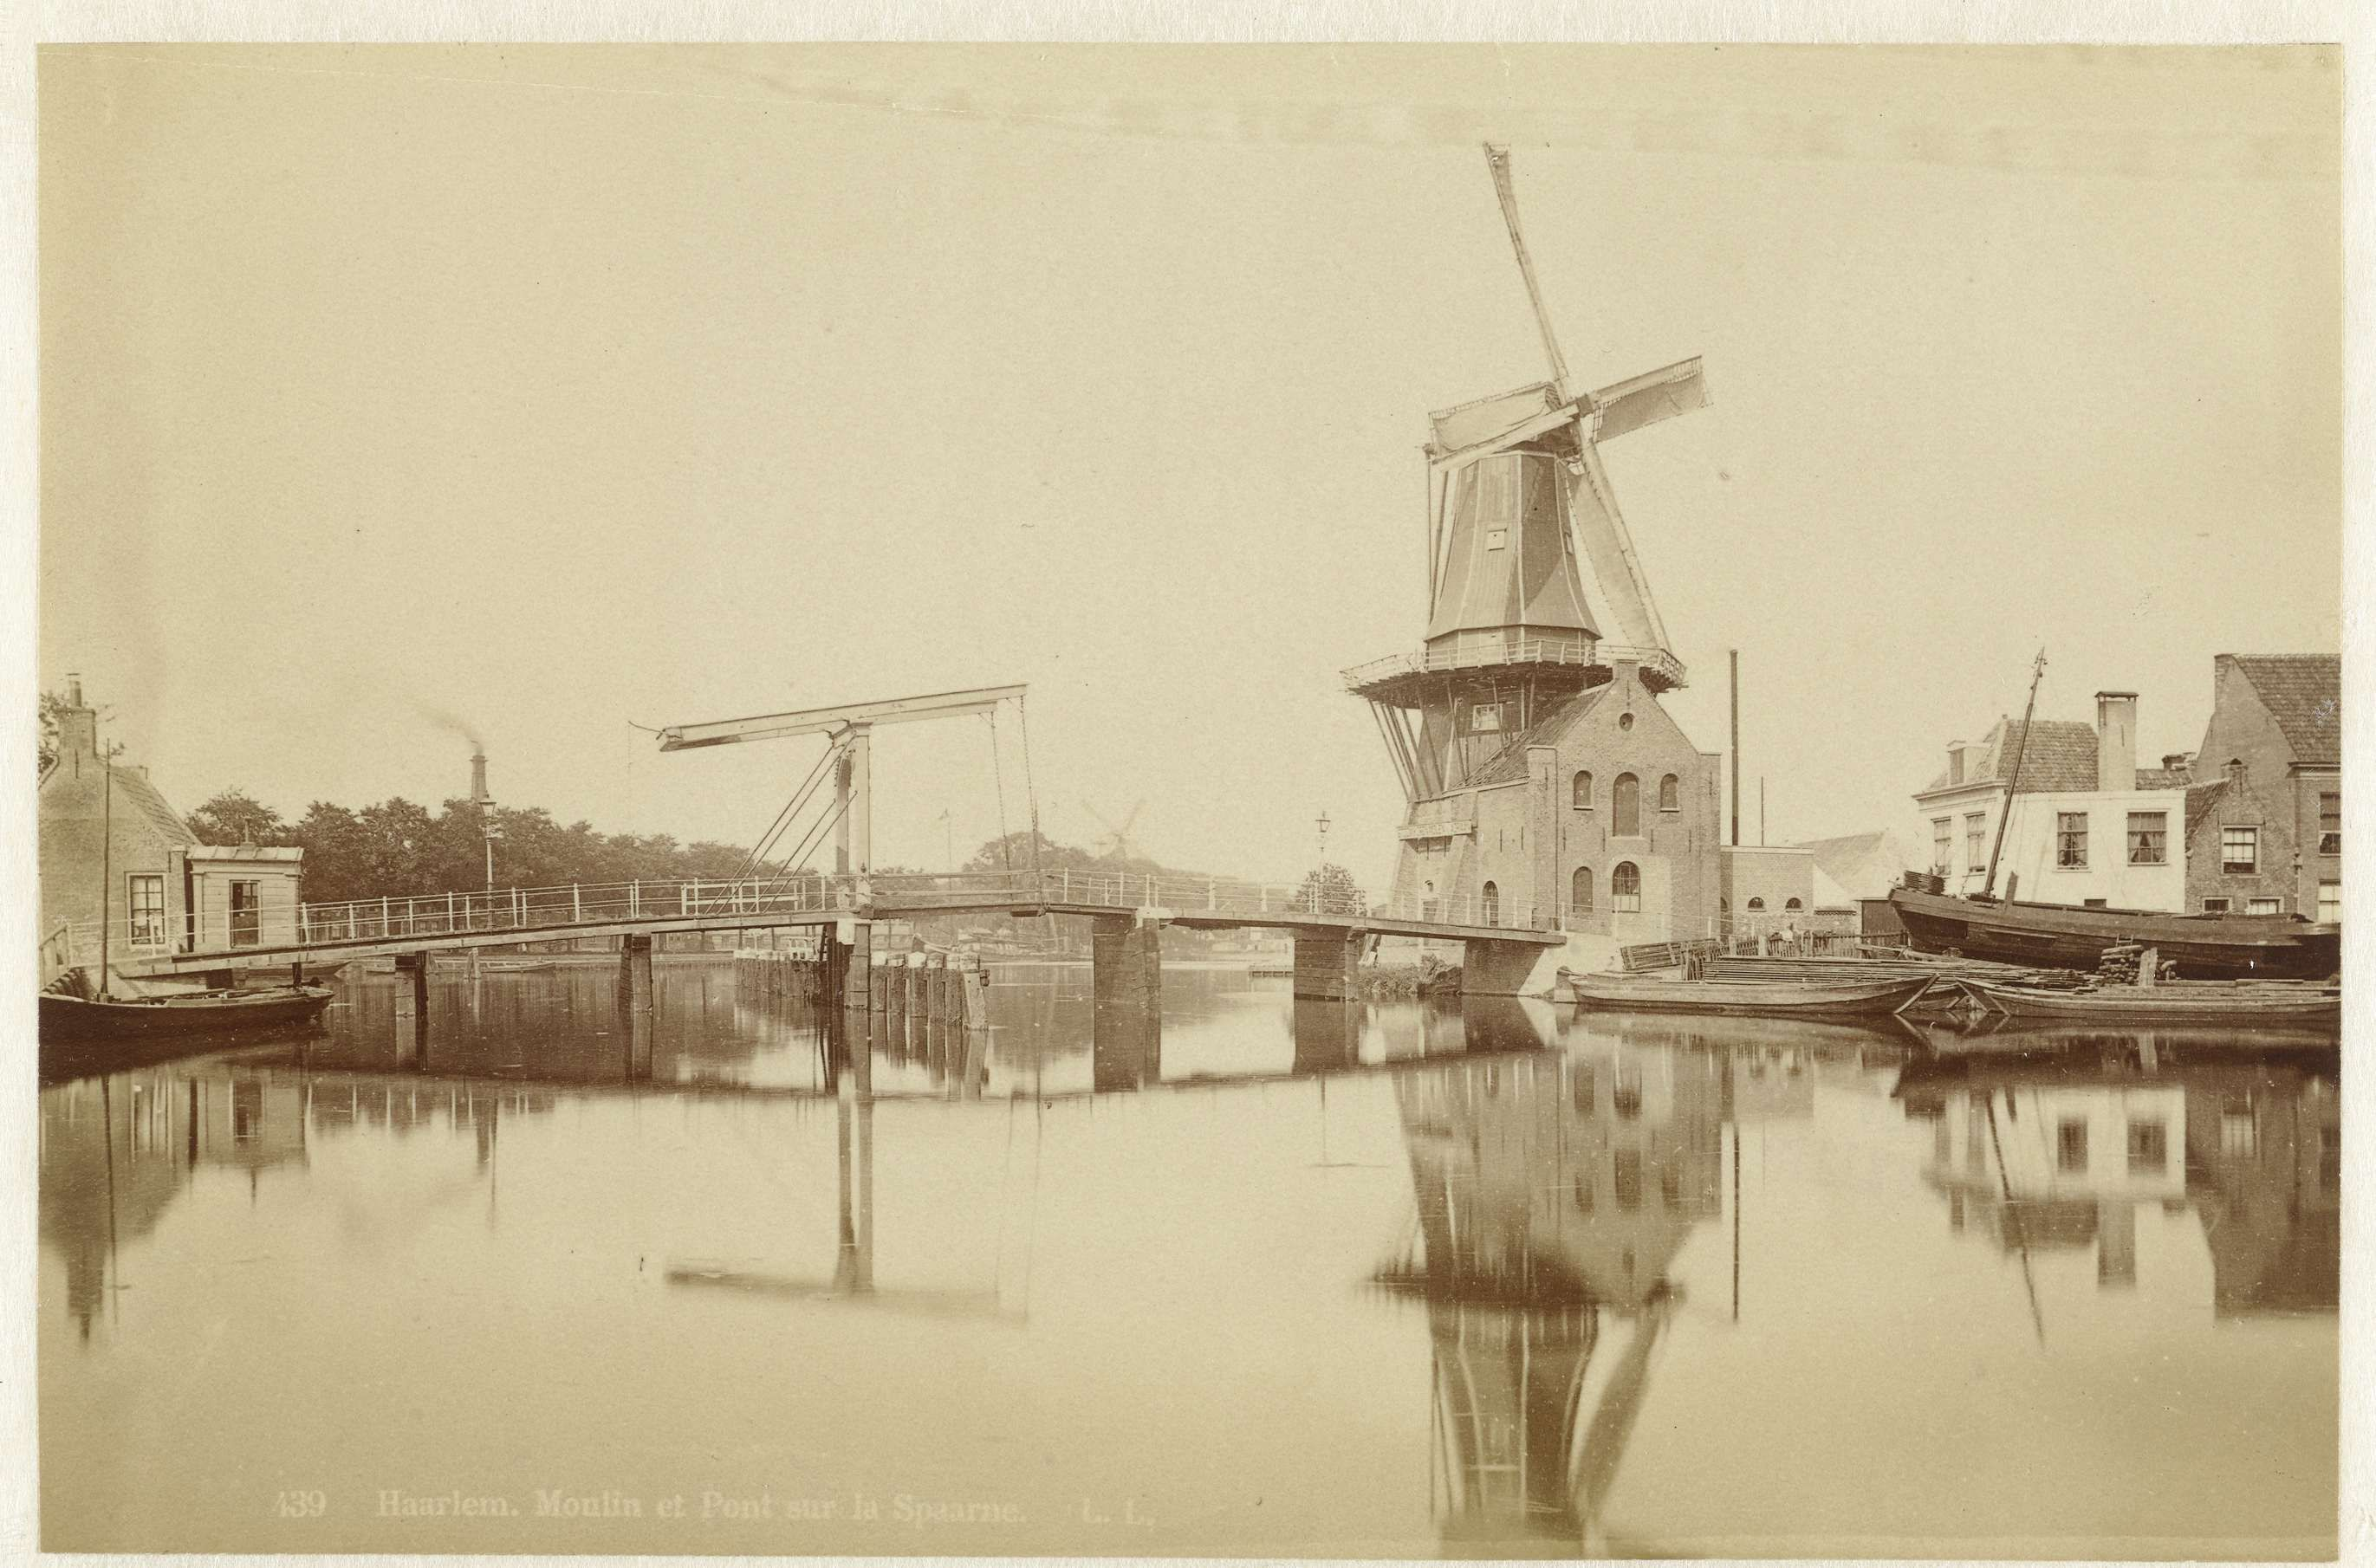 Léon & Lévy   Molen en brug over het Spaarne, Haarlem, Léon & Lévy, M. Léon, J. Lévy, c. 1860 - c. 1880  